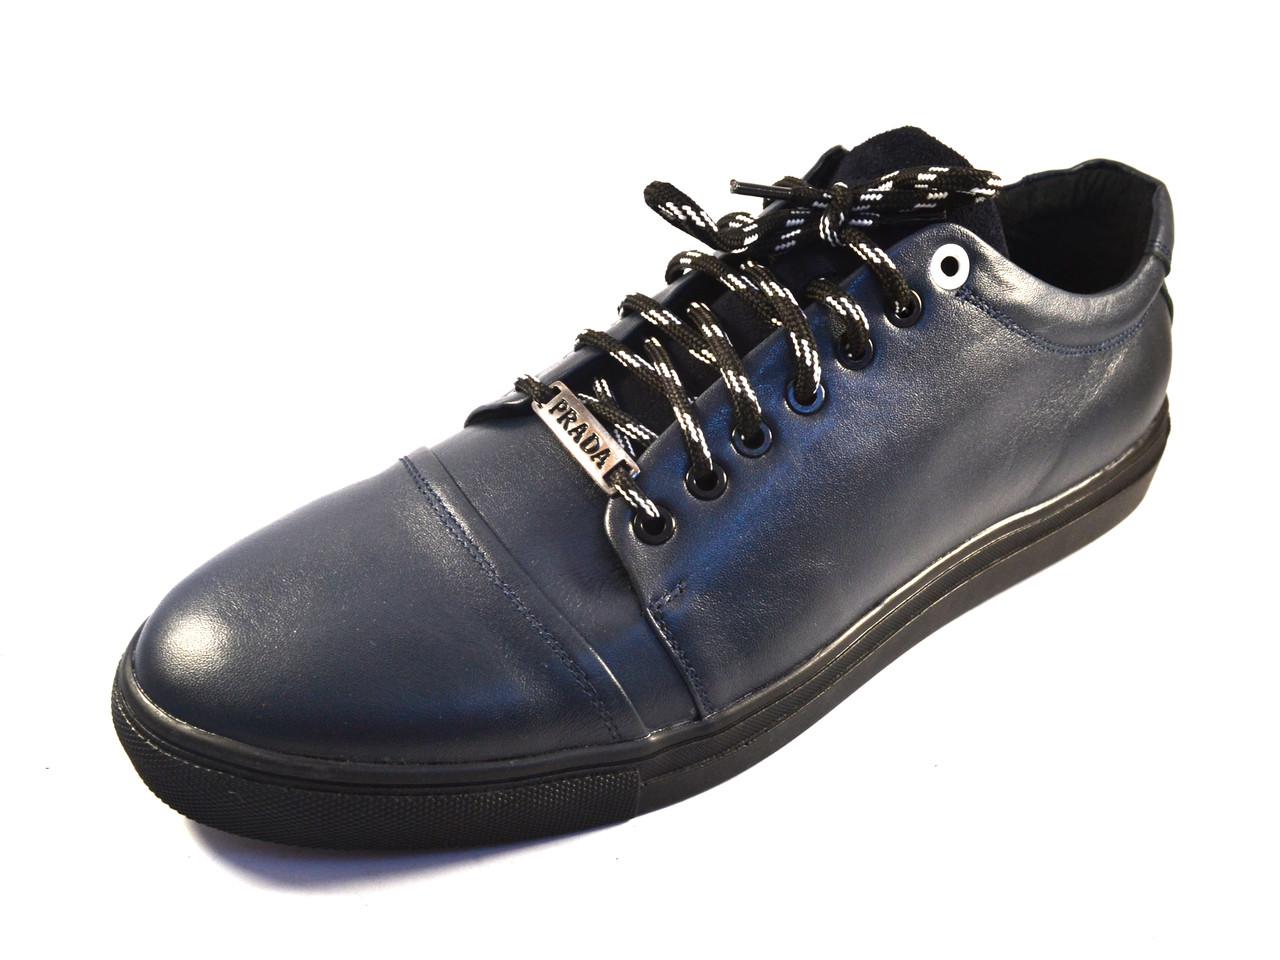 25ed690e Кожаные кроссовки мужские кеды синие Rosso Avangard Gushe Blu , фото 2 ...